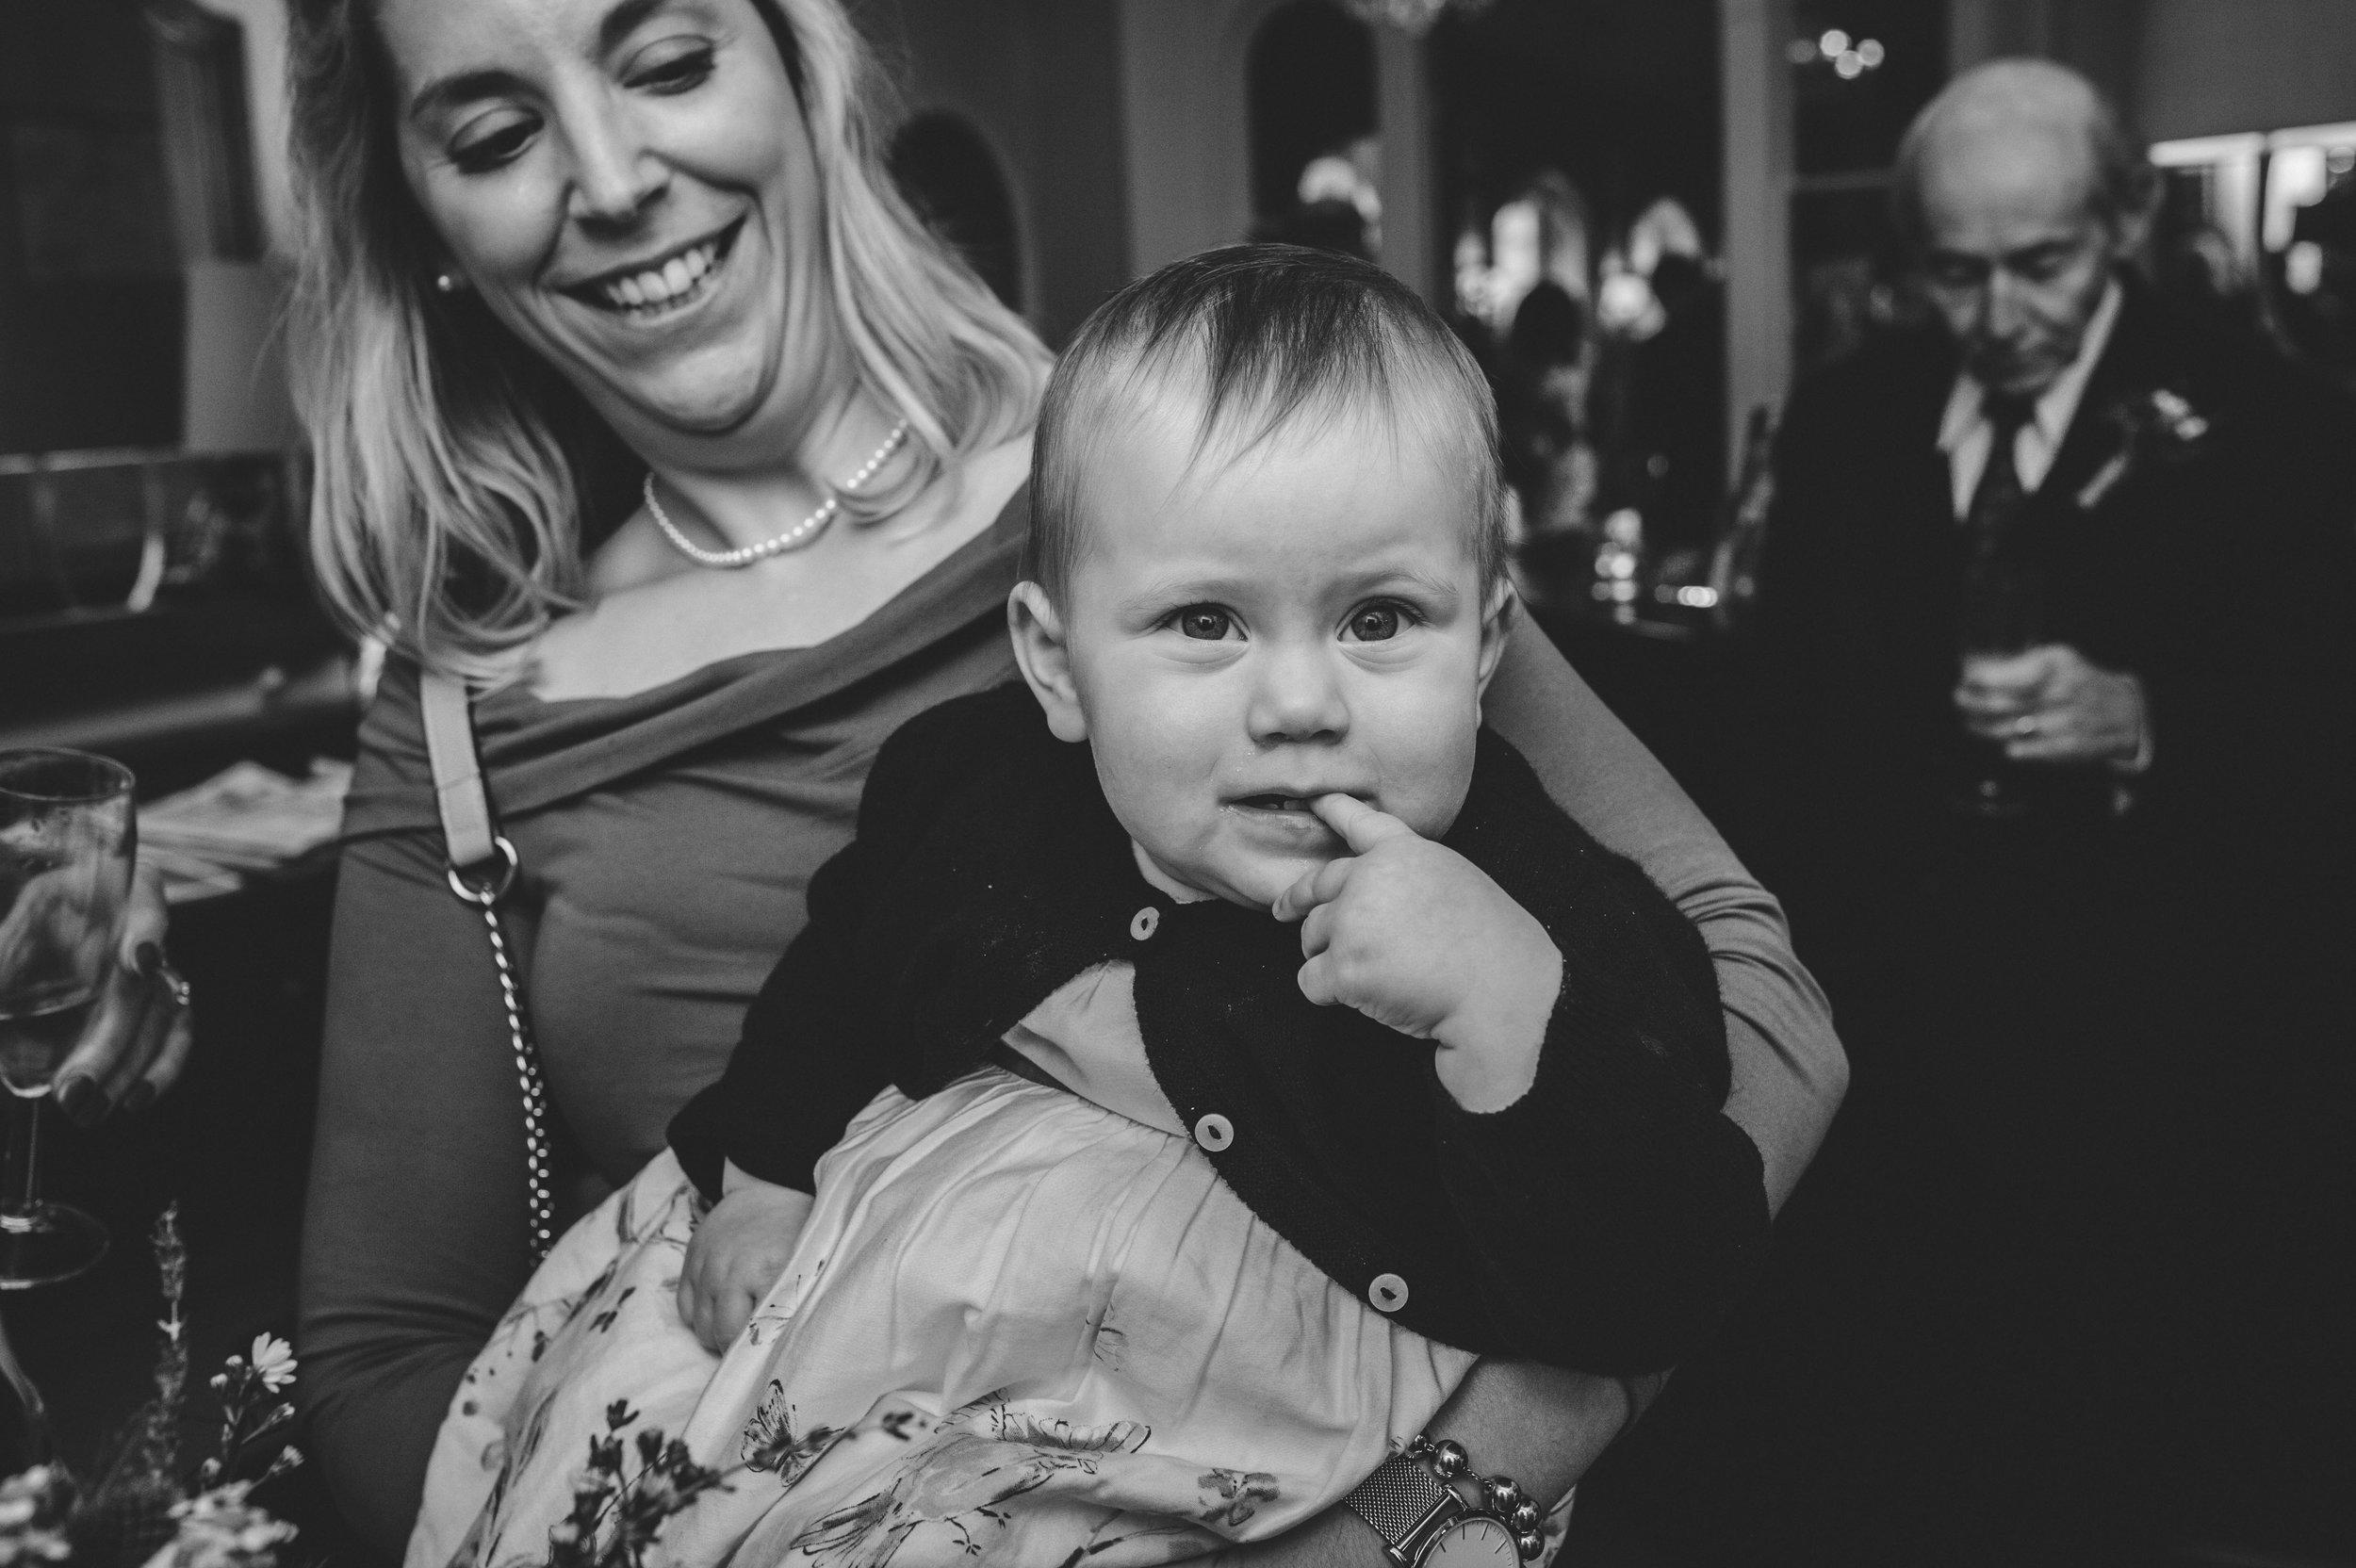 Beechfield house weddings - Abby and Greg (168 of 208).jpg